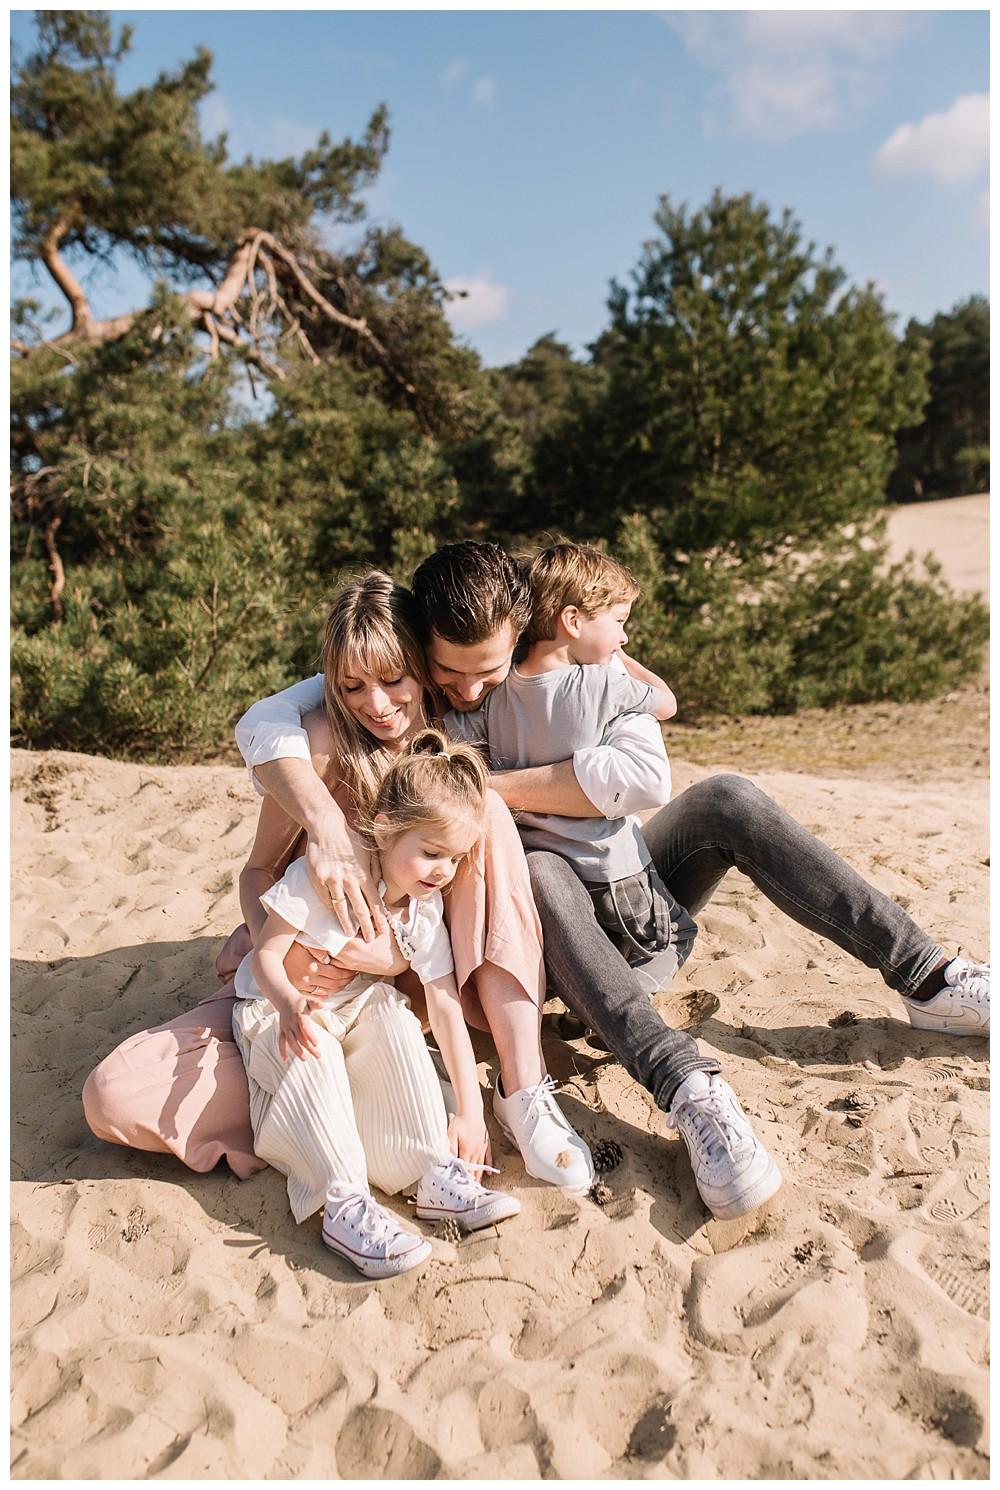 ohbelle_website_blog_gezinsshoot_Lifestyle_buiten_0258-kopie Lifestyle gezinsshoot Wekeromse Zand